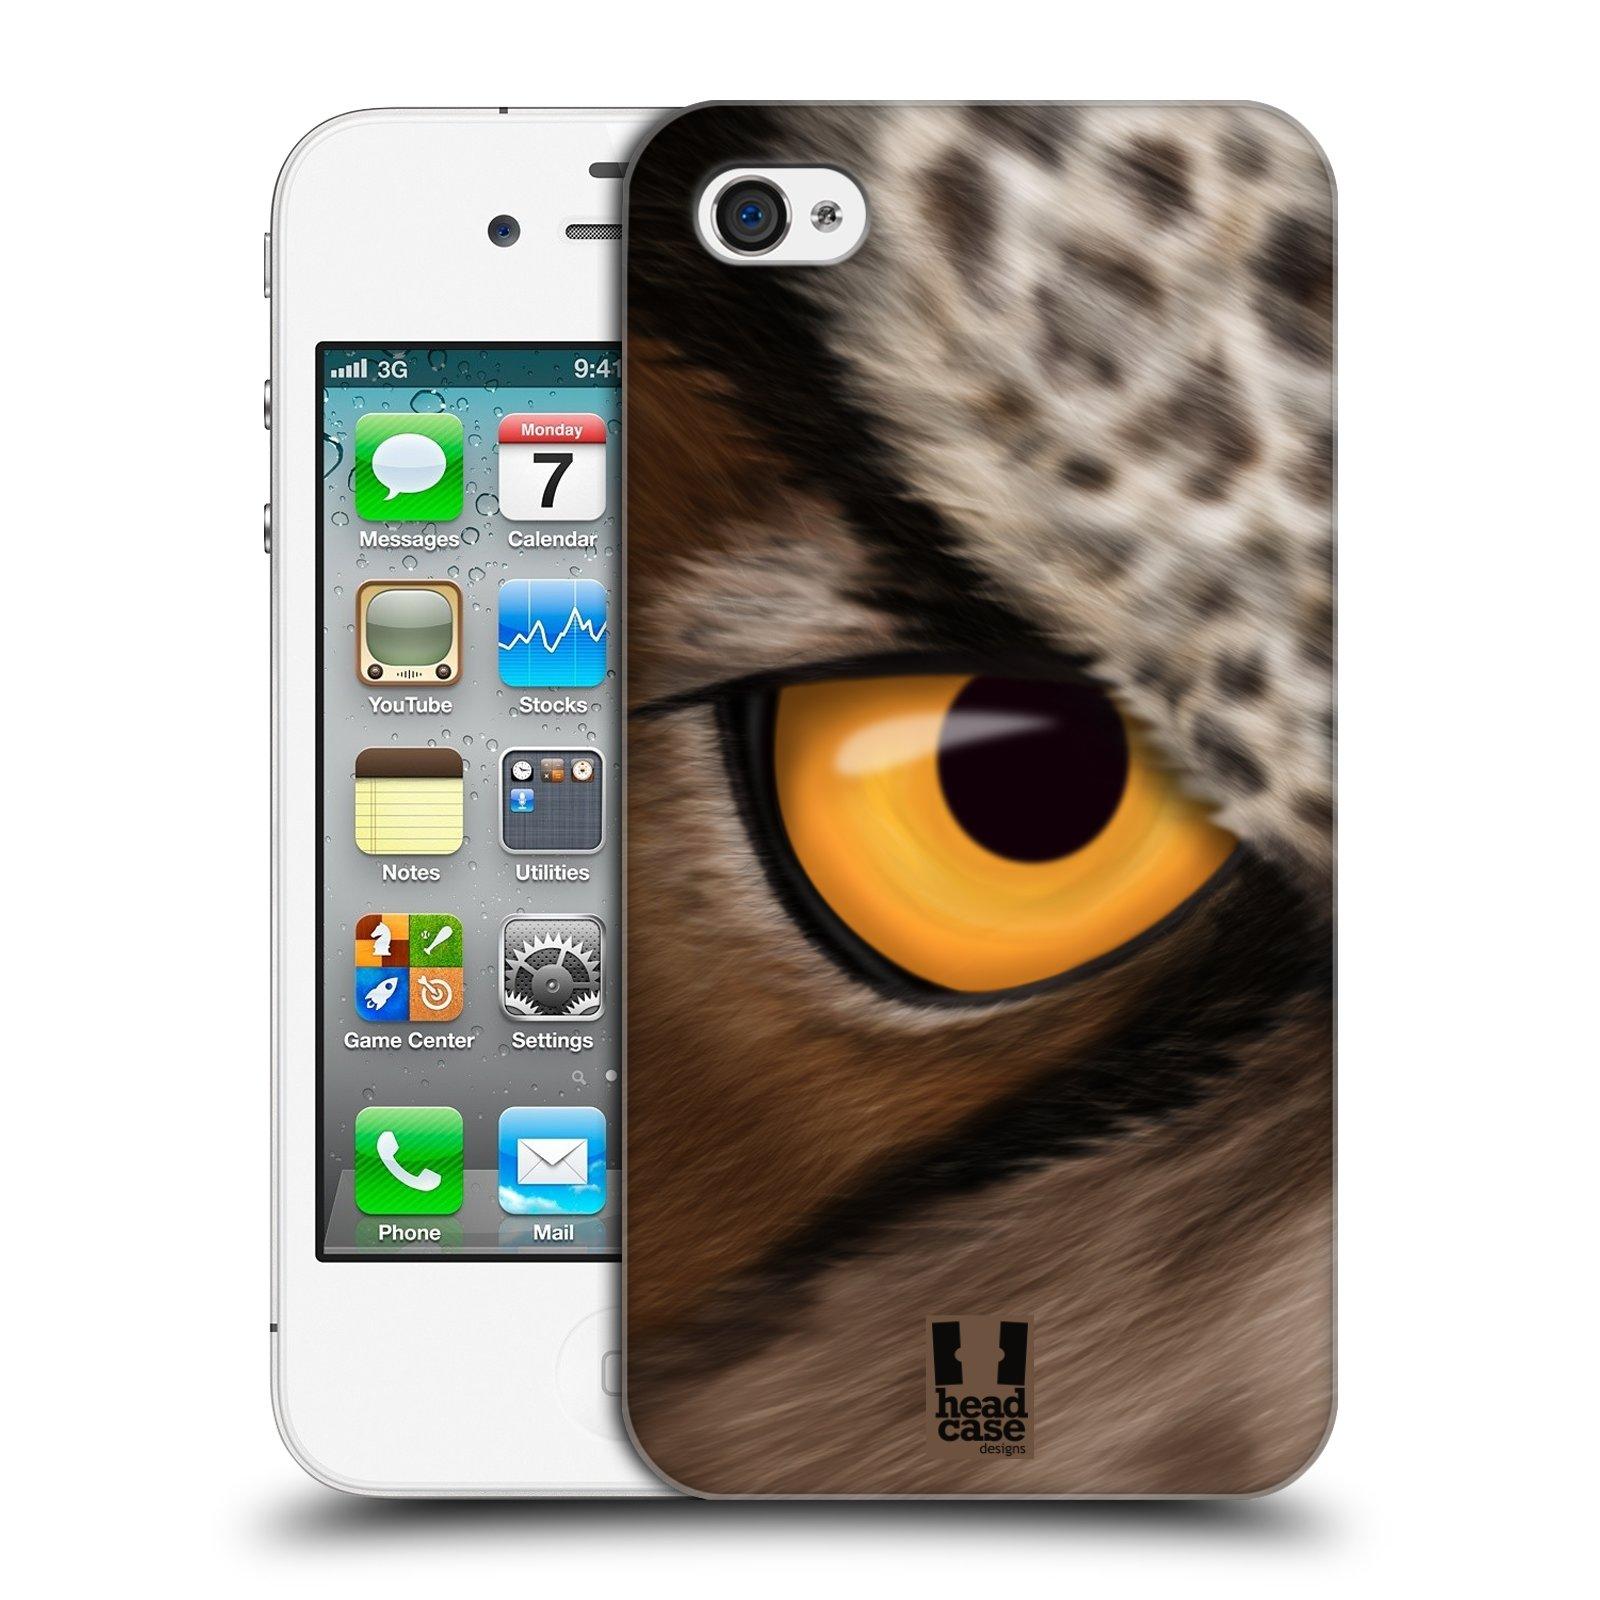 HEAD CASE plastový obal na mobil Apple Iphone 4/4S vzor pohled zvířete oko sova